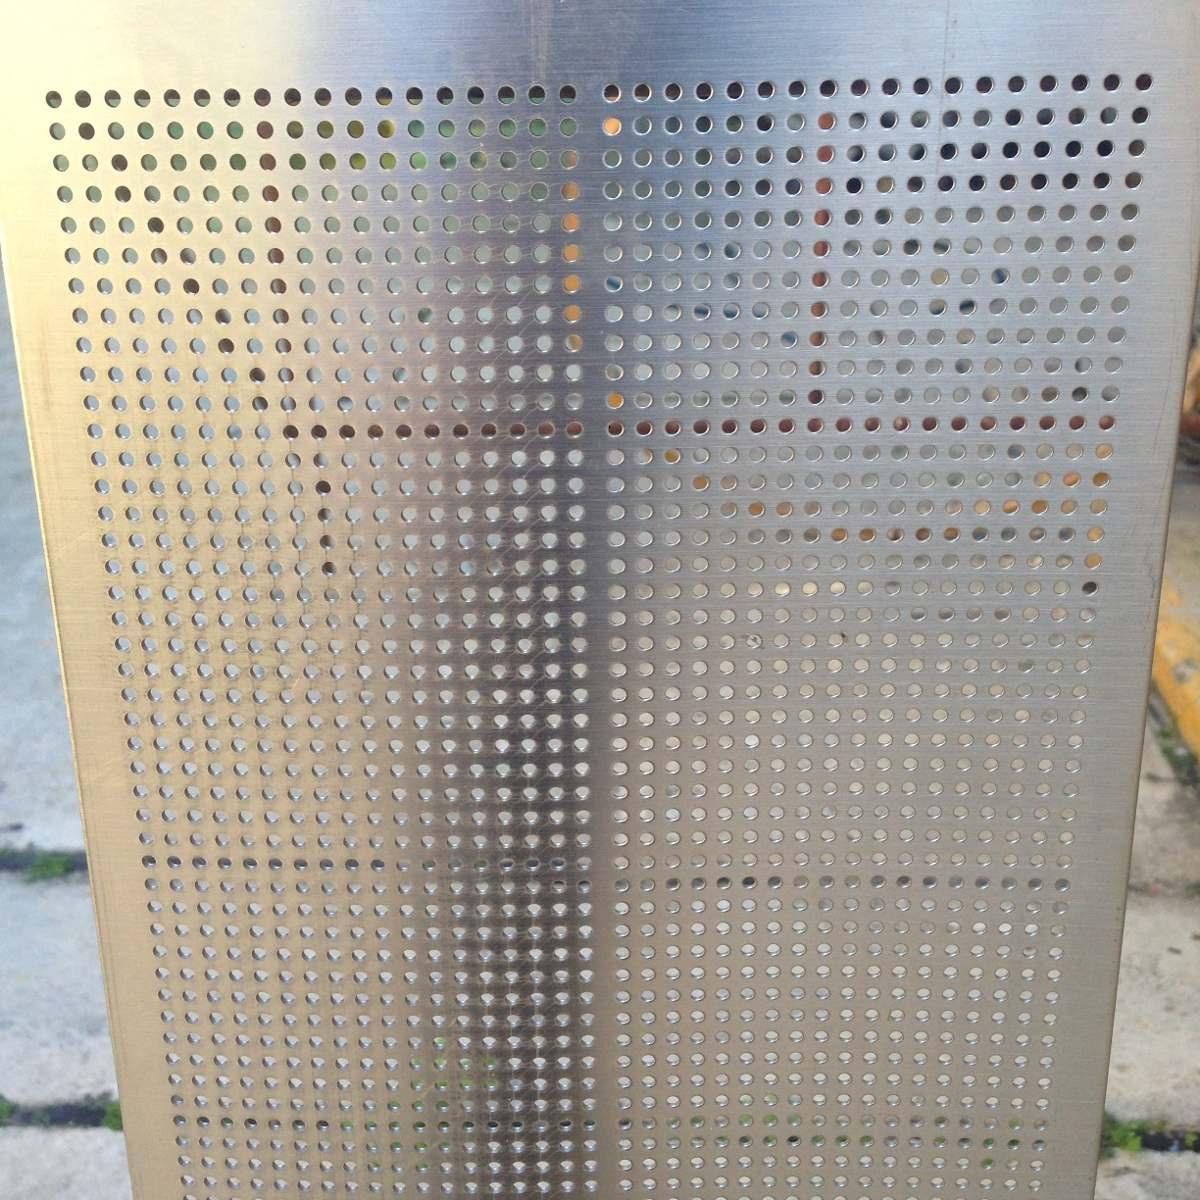 Lamina microperforada acero inoxidable circular 2 mm bs - Laminas de acero inoxidable ...